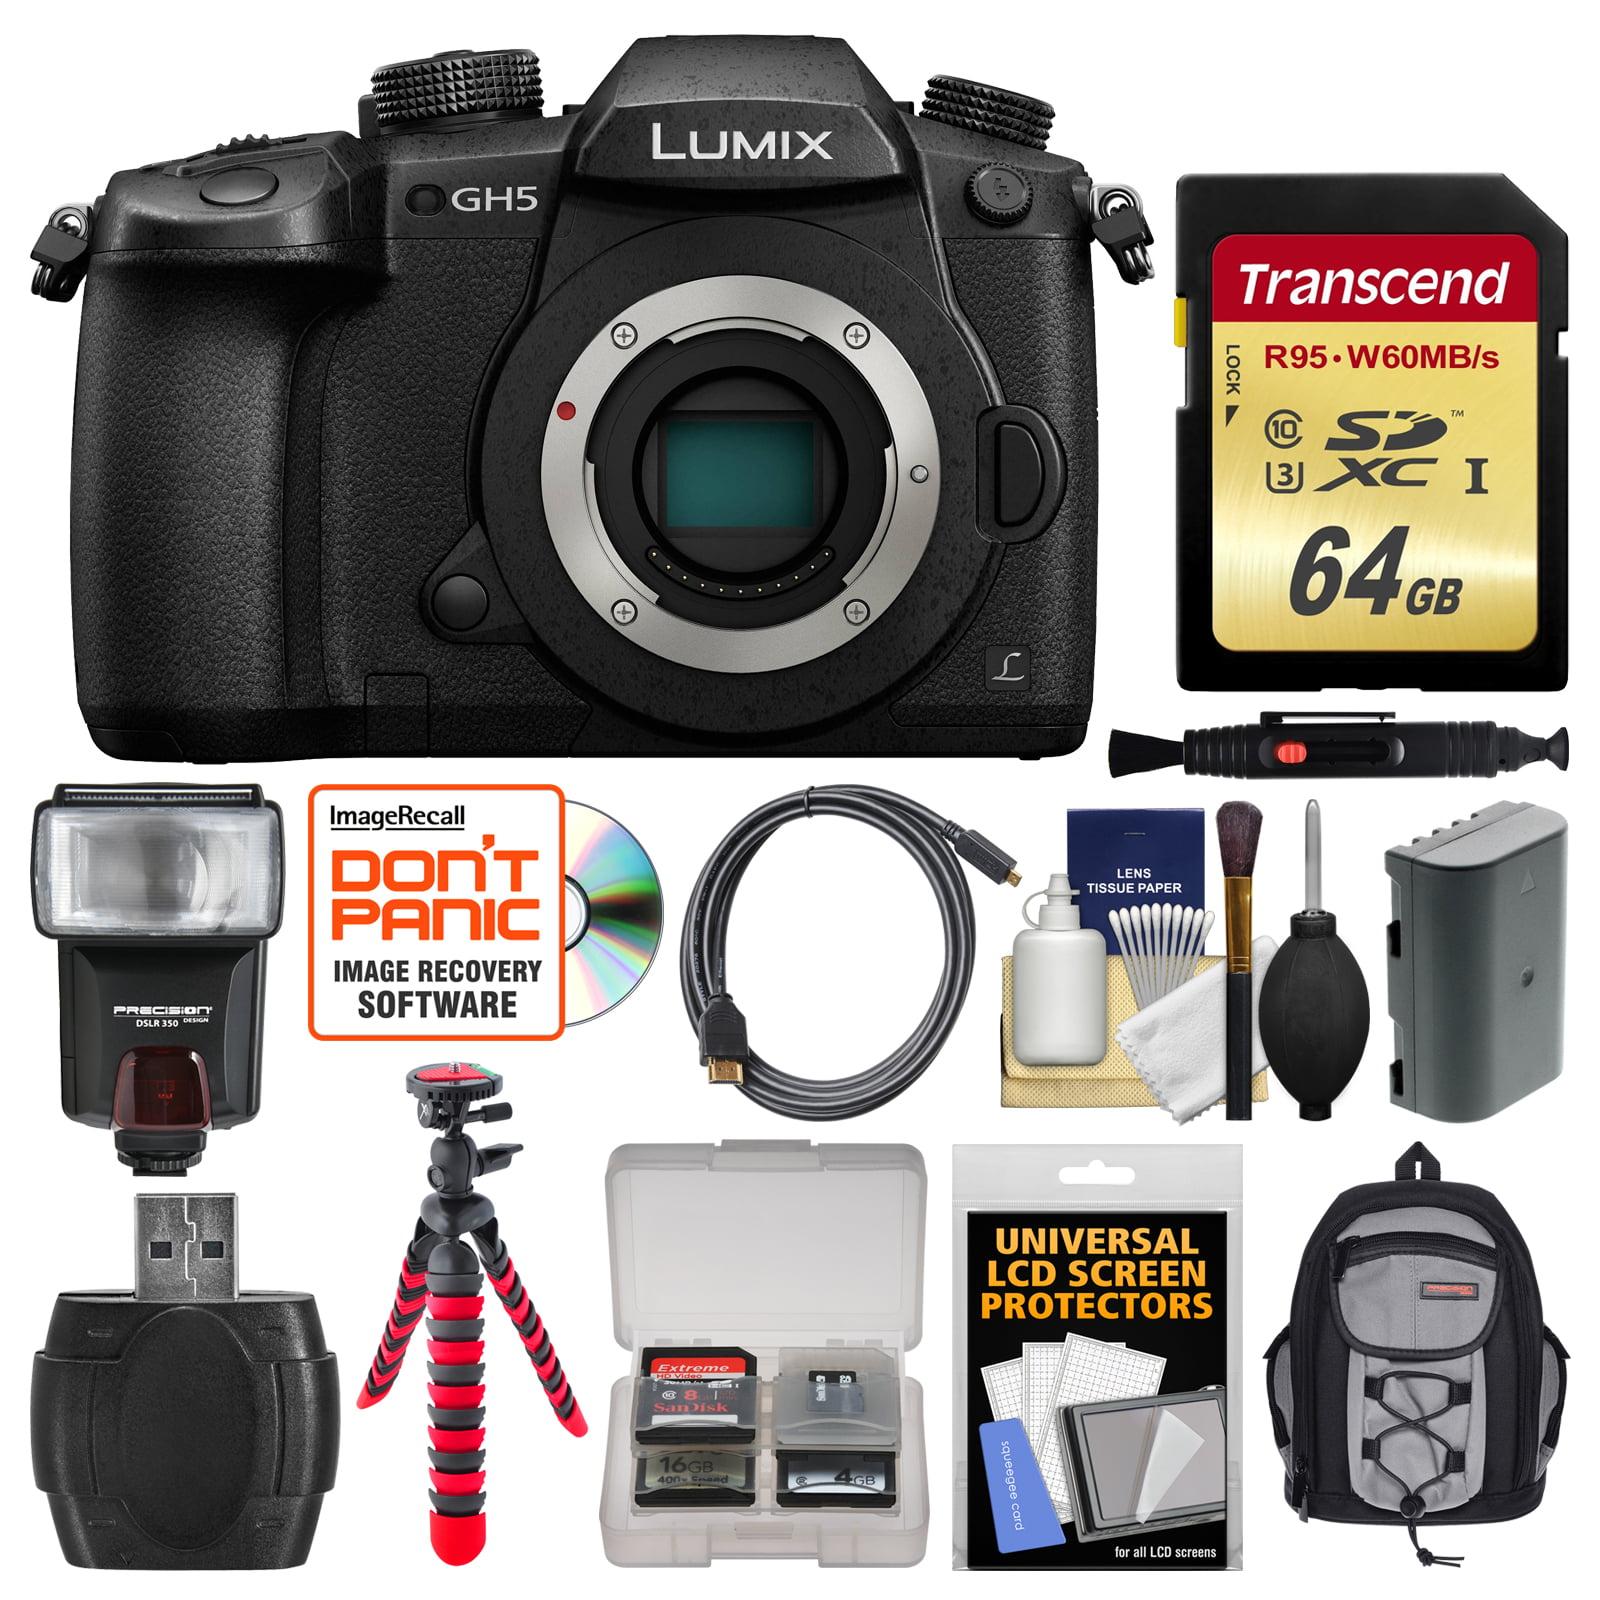 Panasonic Lumix DC-GH5 Wi-Fi 4K Digital Camera Body with 12-35mm Lens + 64GB Card + Backpack + Flash + Battery... by Panasonic